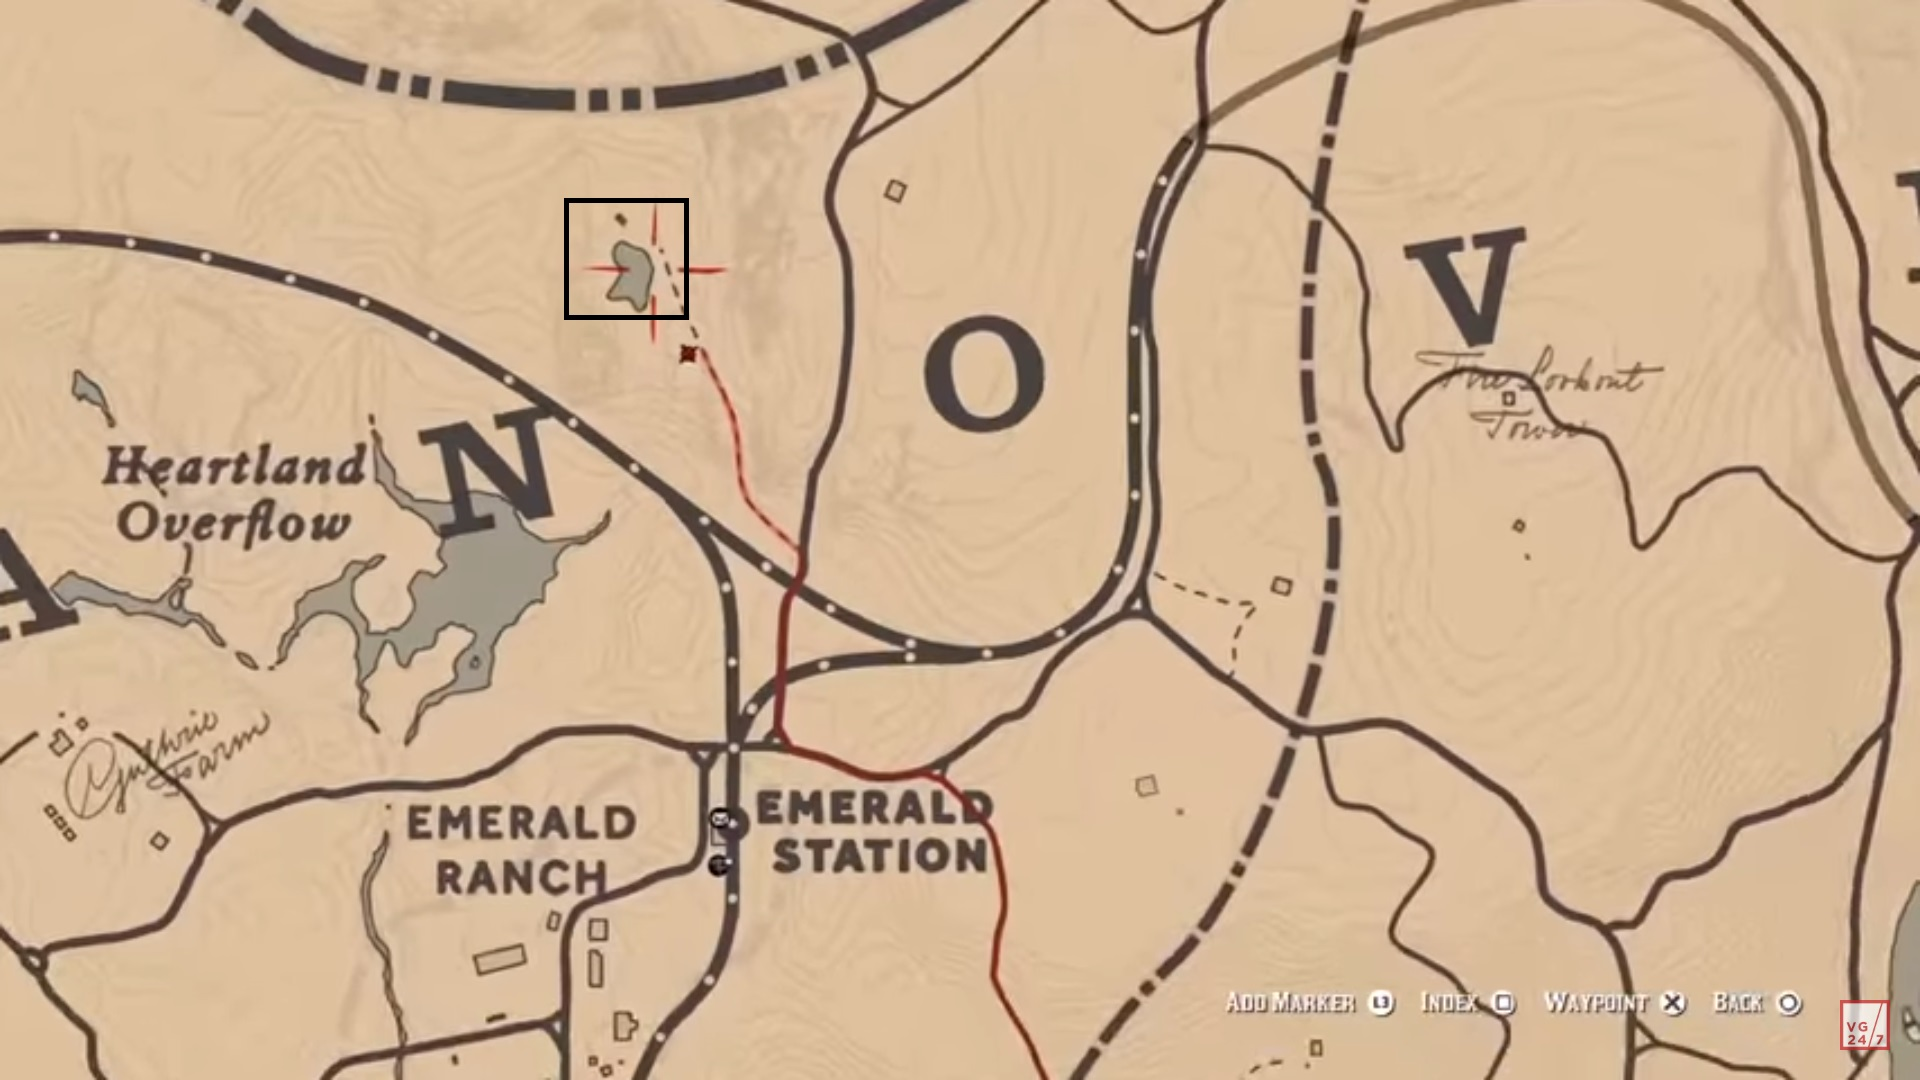 Segredos de Red Dead Redemption 2: como encontrar uma nave alien 1